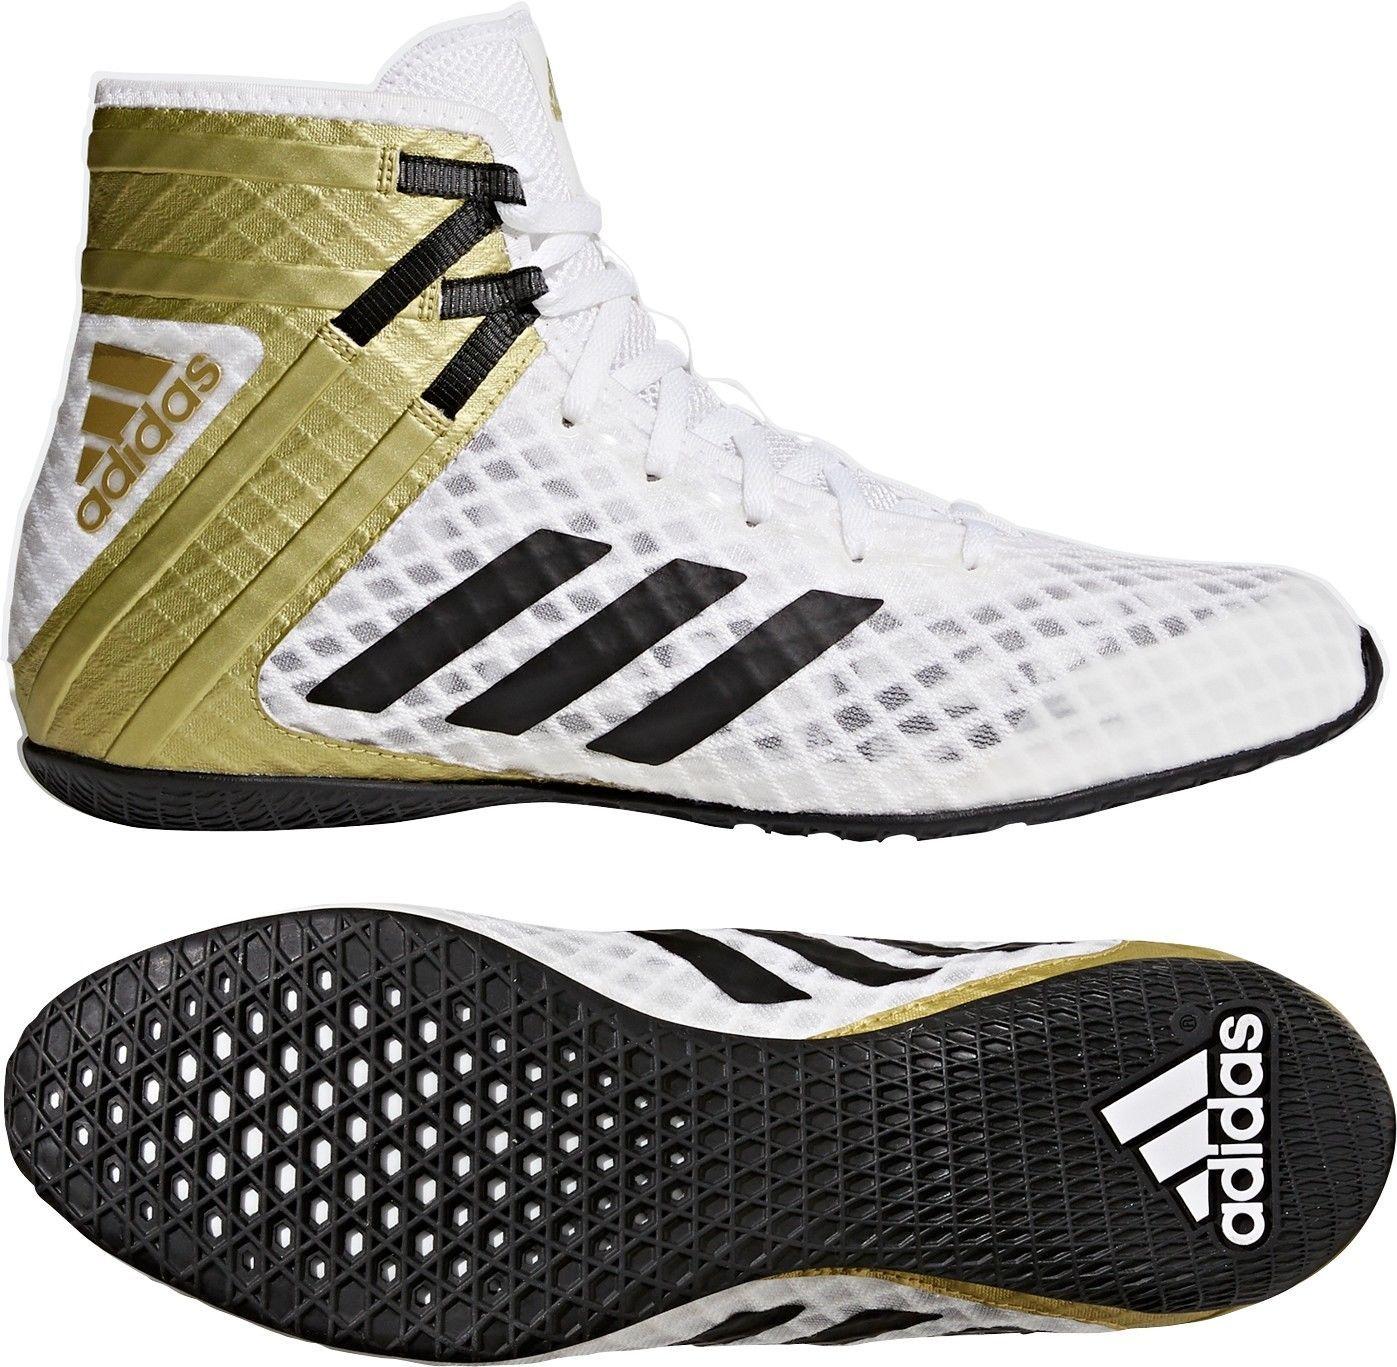 adidas Speedex 16.1 Unisex Boxing Shoes Red Mens Junior Women Boxing Boots